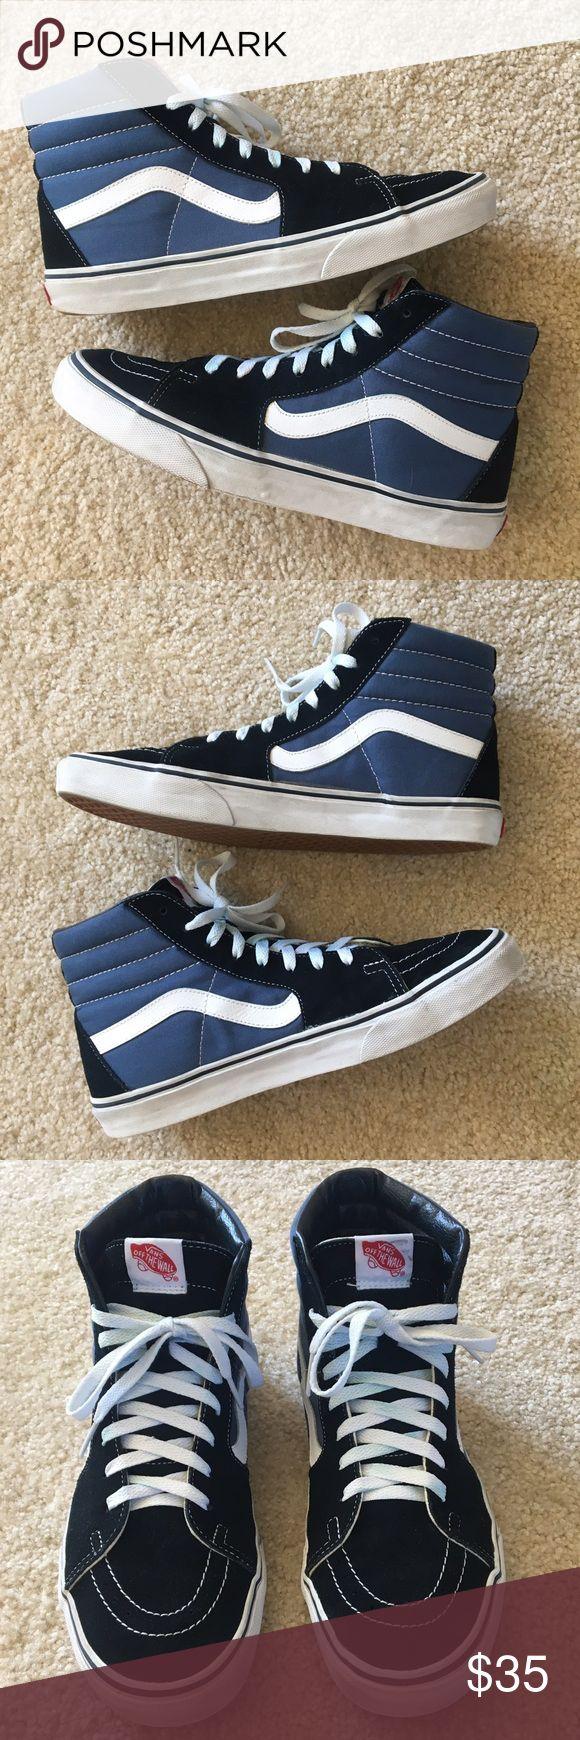 Vans Sk-8 HI's Vans Sk-8 HI's                                                                          Color: Black & Blue         Size: 10.5         Condition: Great Vans Shoes Sneakers